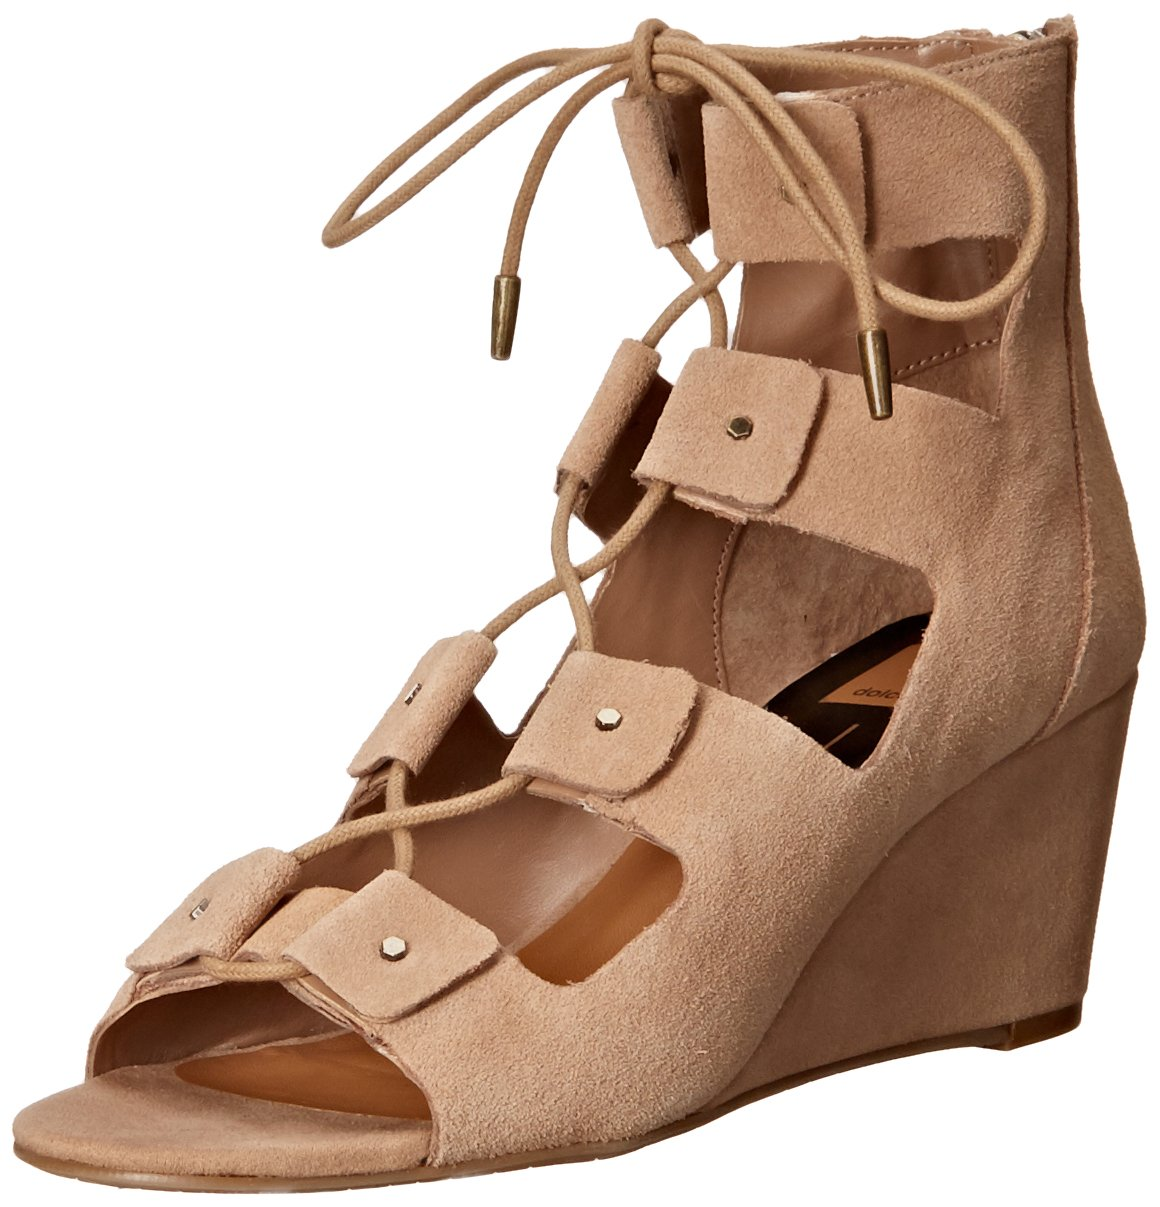 Dolce Vita Women's Liana Wedge Sandal B01C72K8IW 6 B(M) US|Taupe